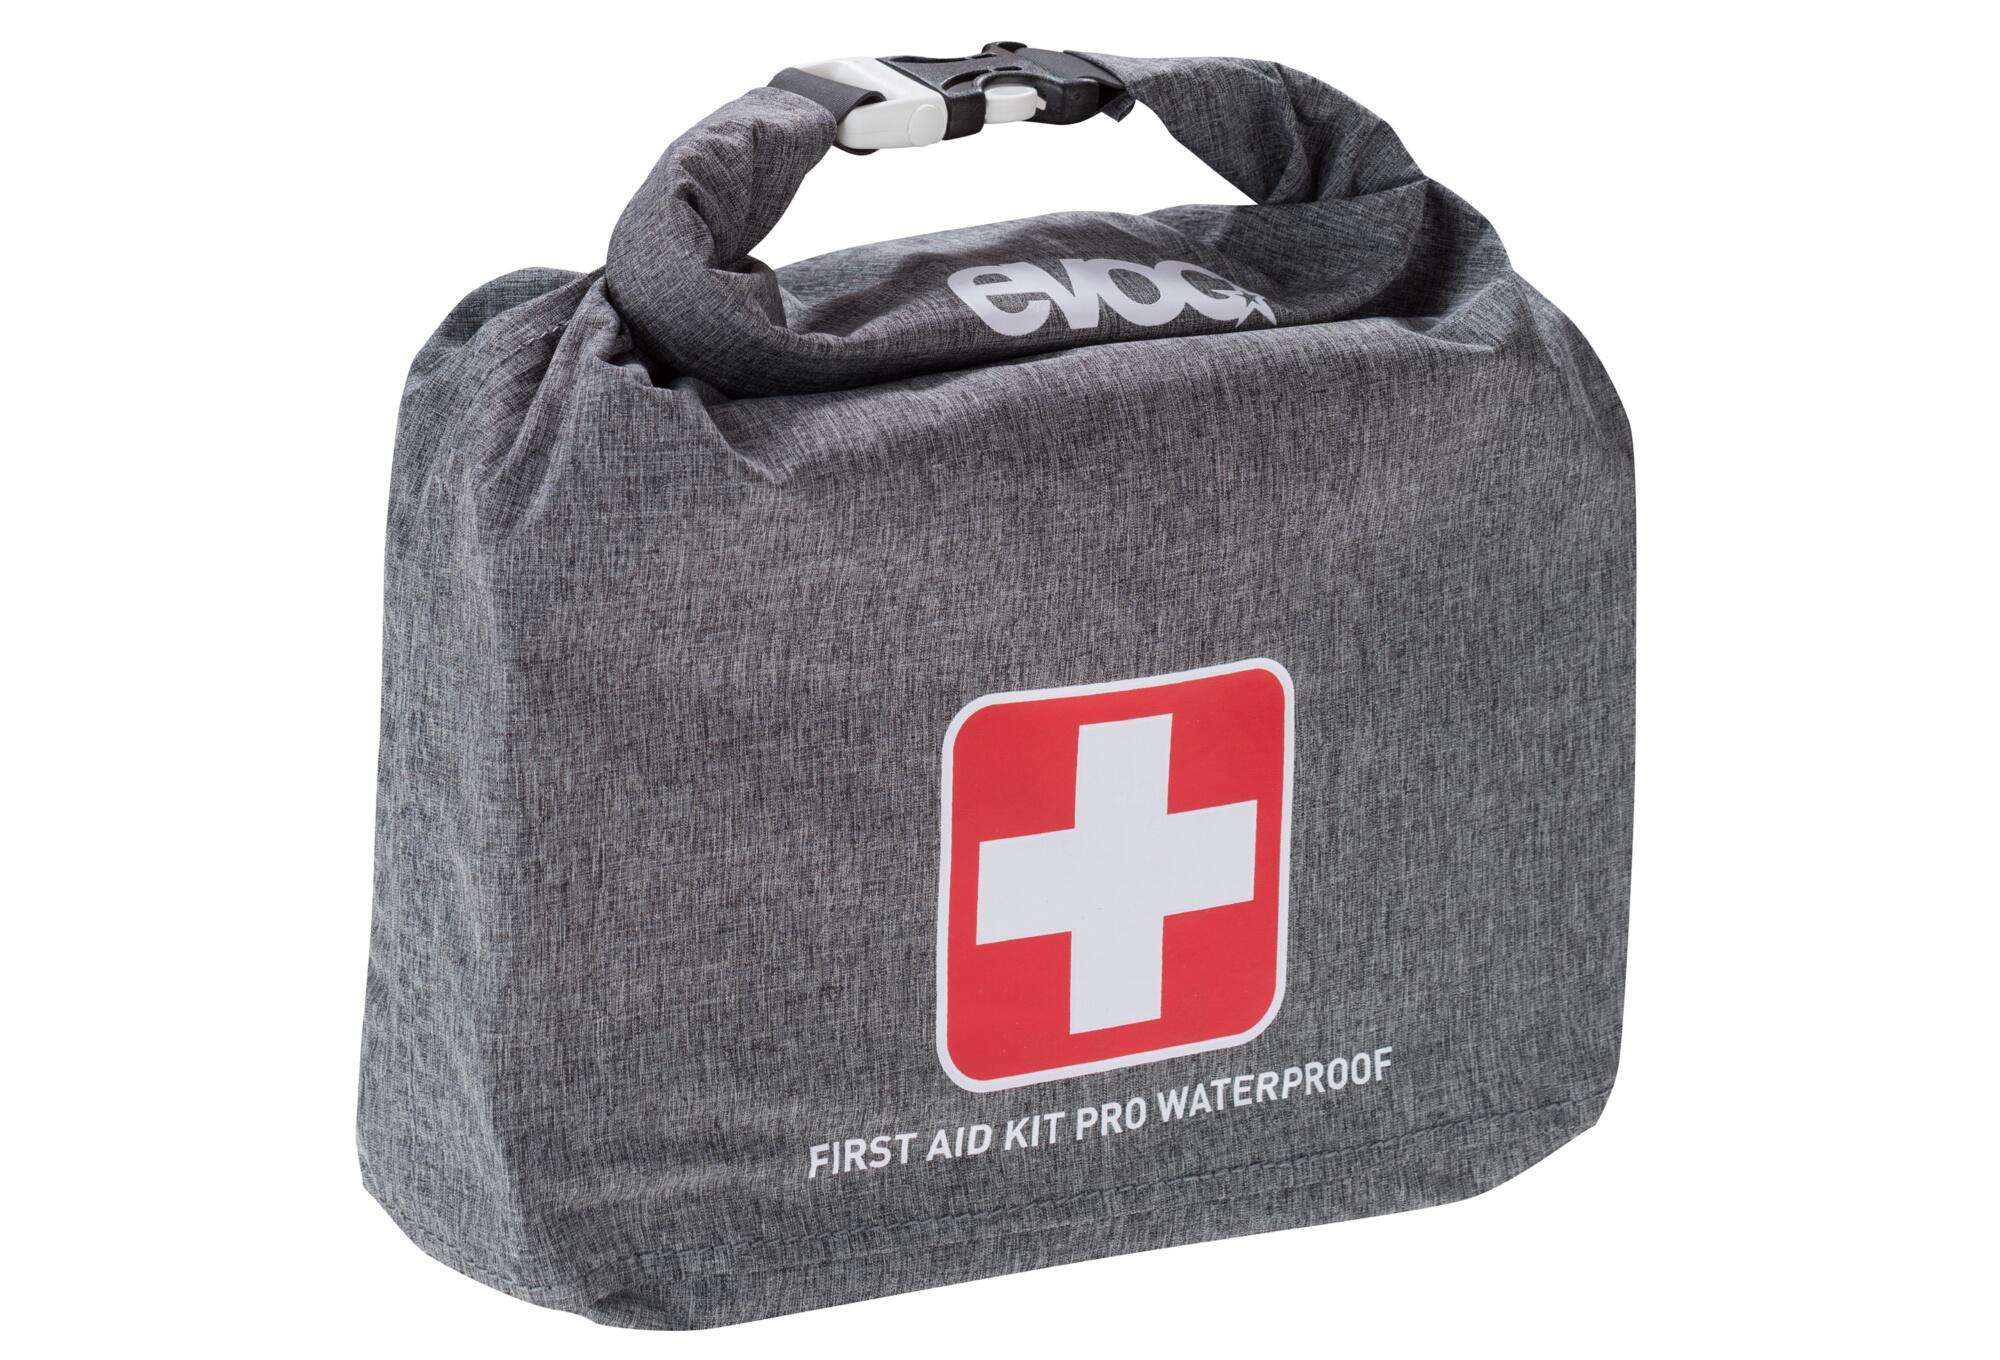 Trousse De Secours Rfx Care Allround First Aid 62 Pièces qflIGKO